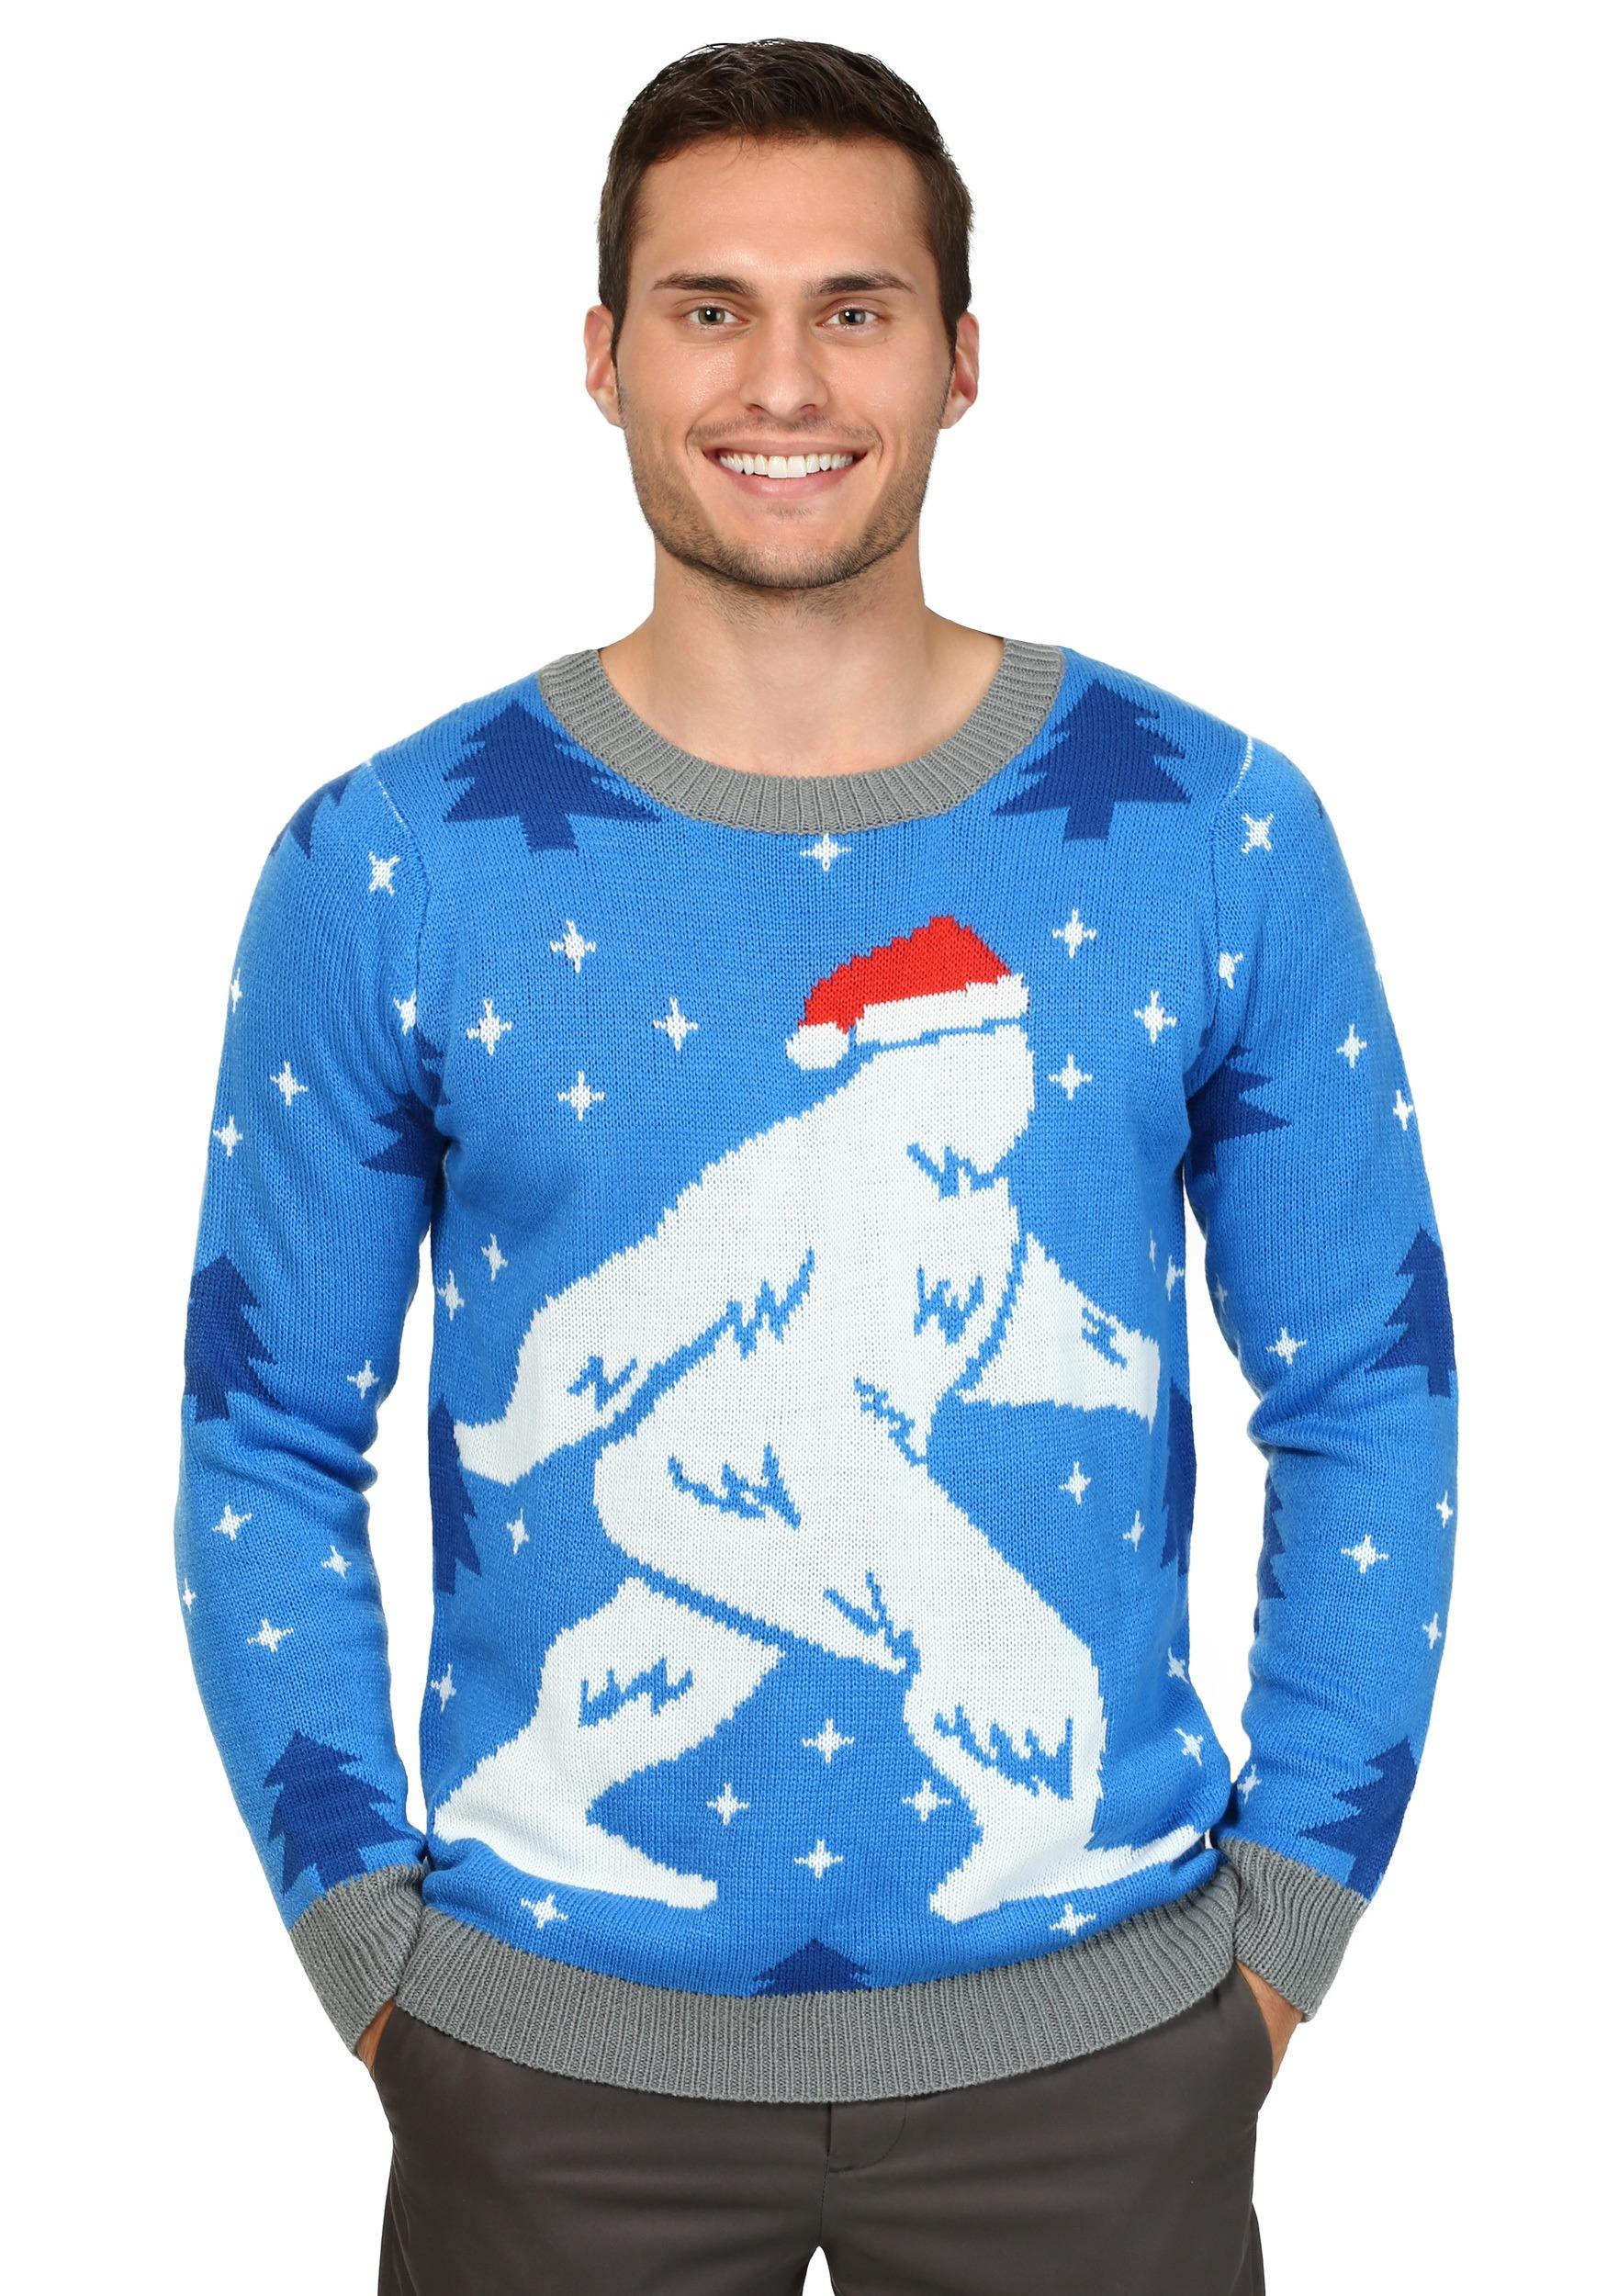 Yeti Ugly Christmas Sweater